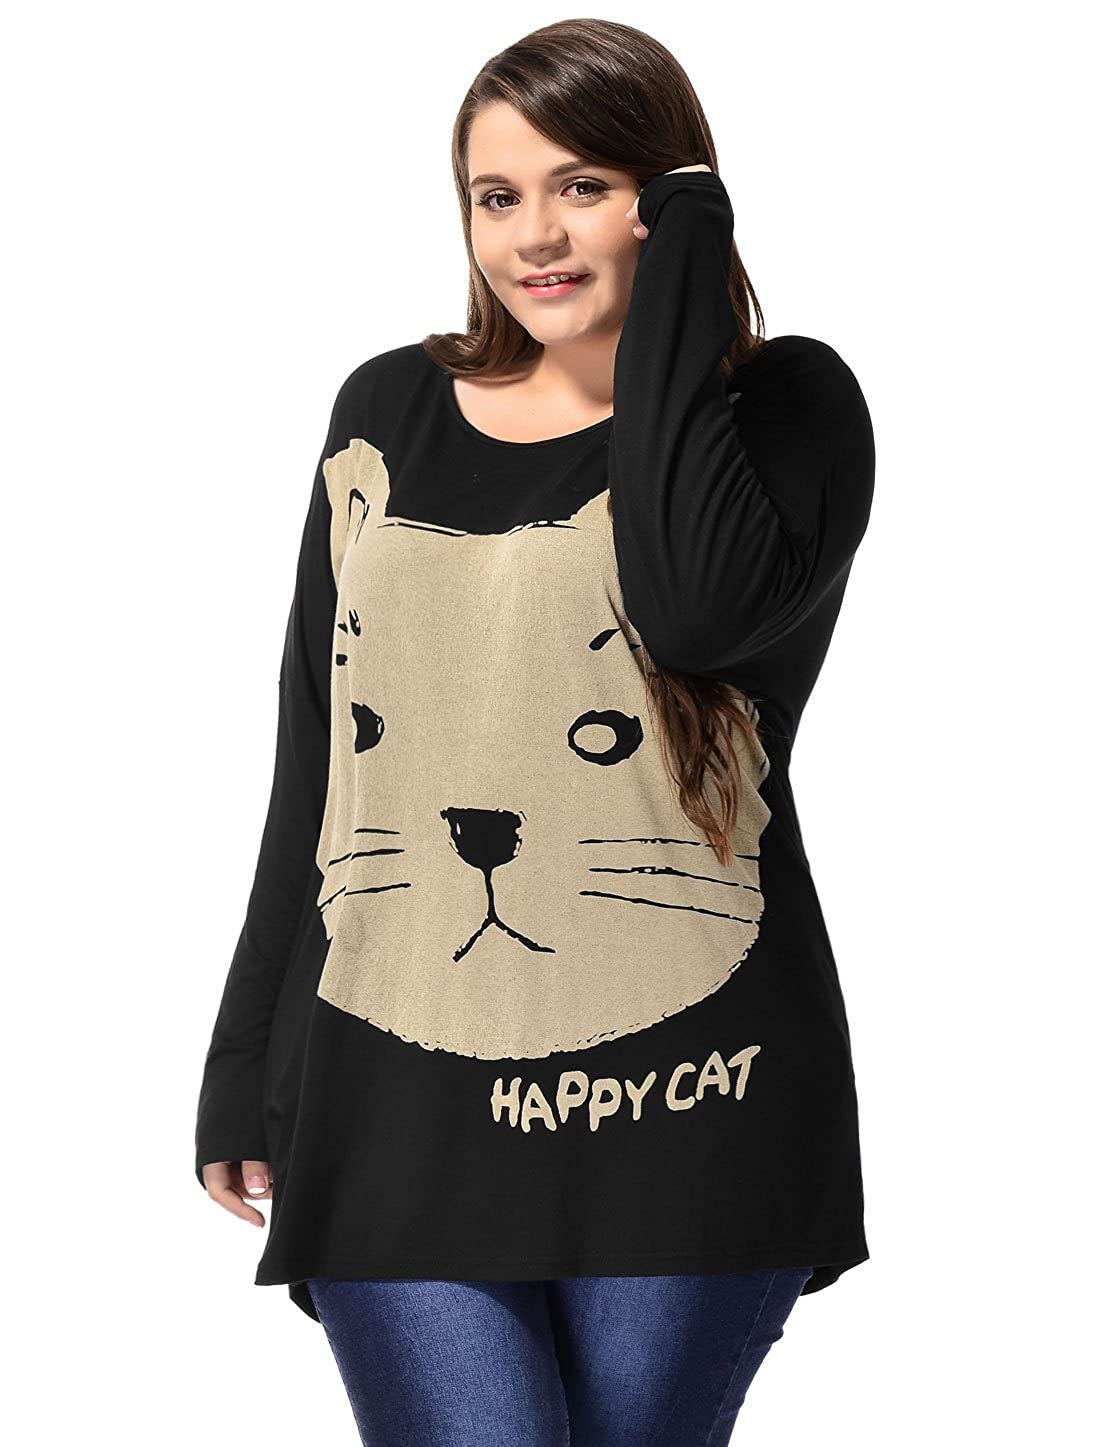 64e5ff2d9 Allegra K Allegra K Ladies Plus Size Cat Head Prints Batwing Tunic T-Shirt:  Amazon.ca: Clothing & Accessories